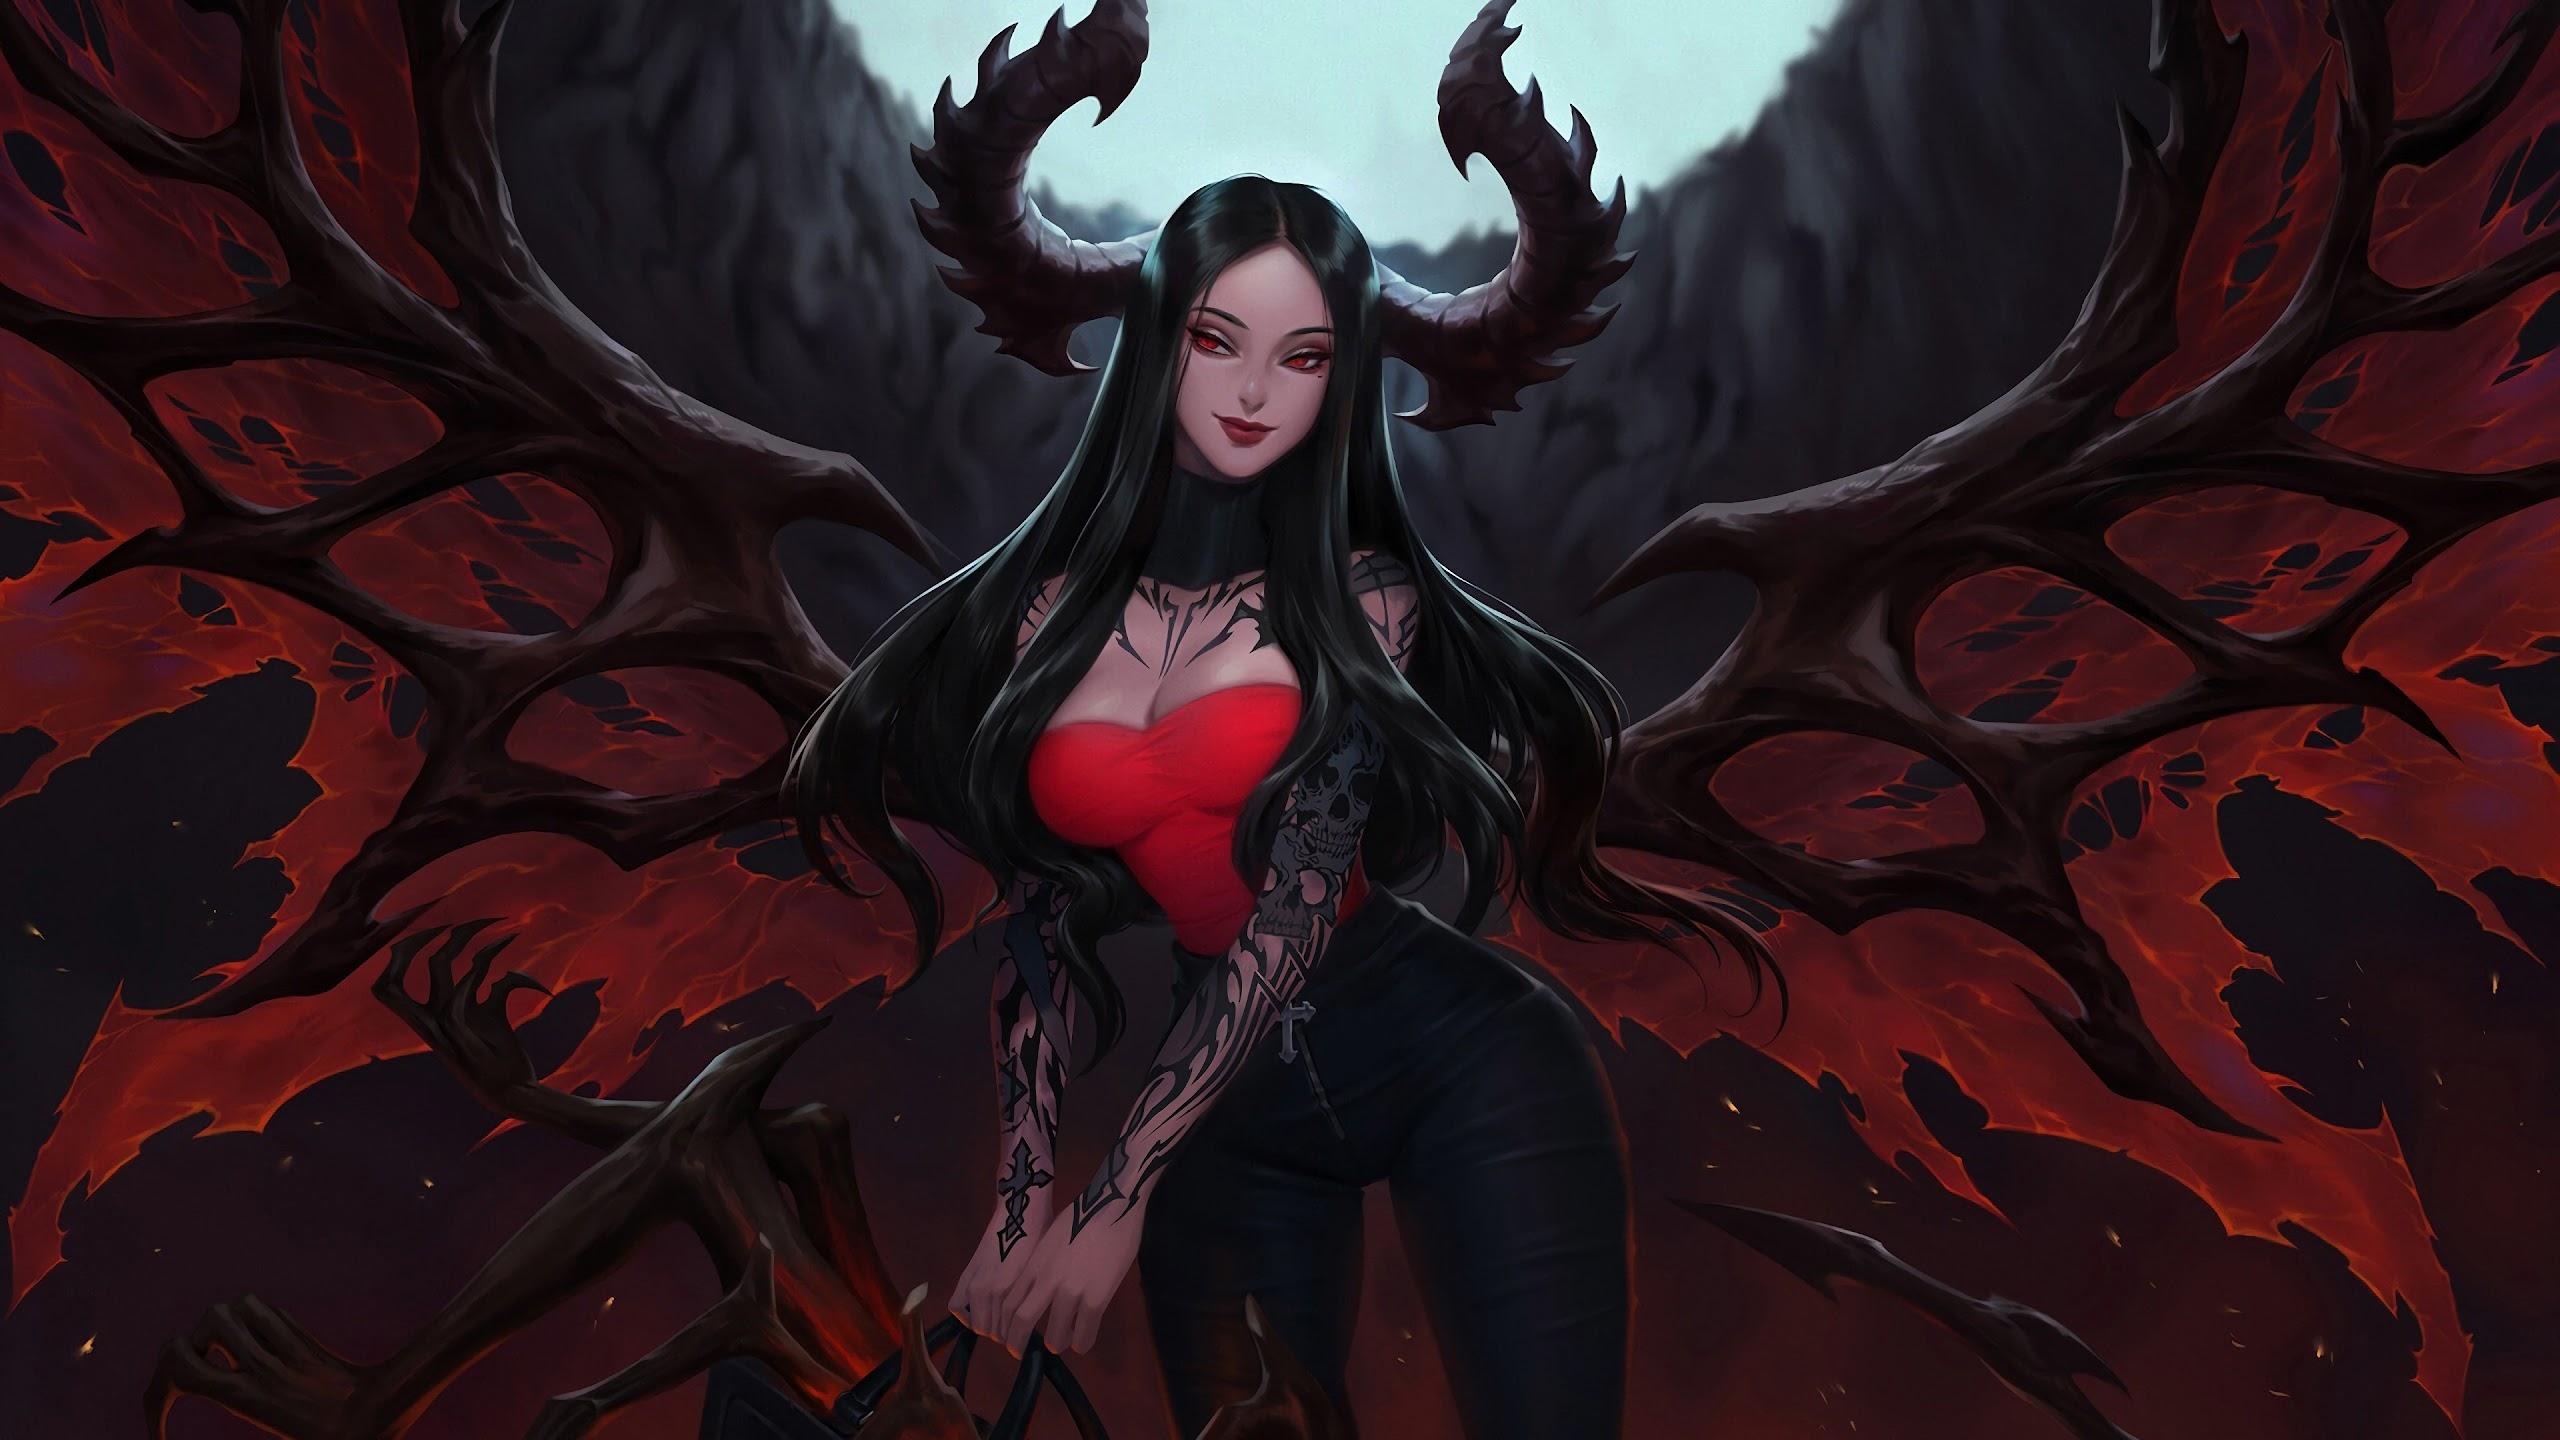 Fantasy Demon Girl Tattoo 4k Wallpaper 157